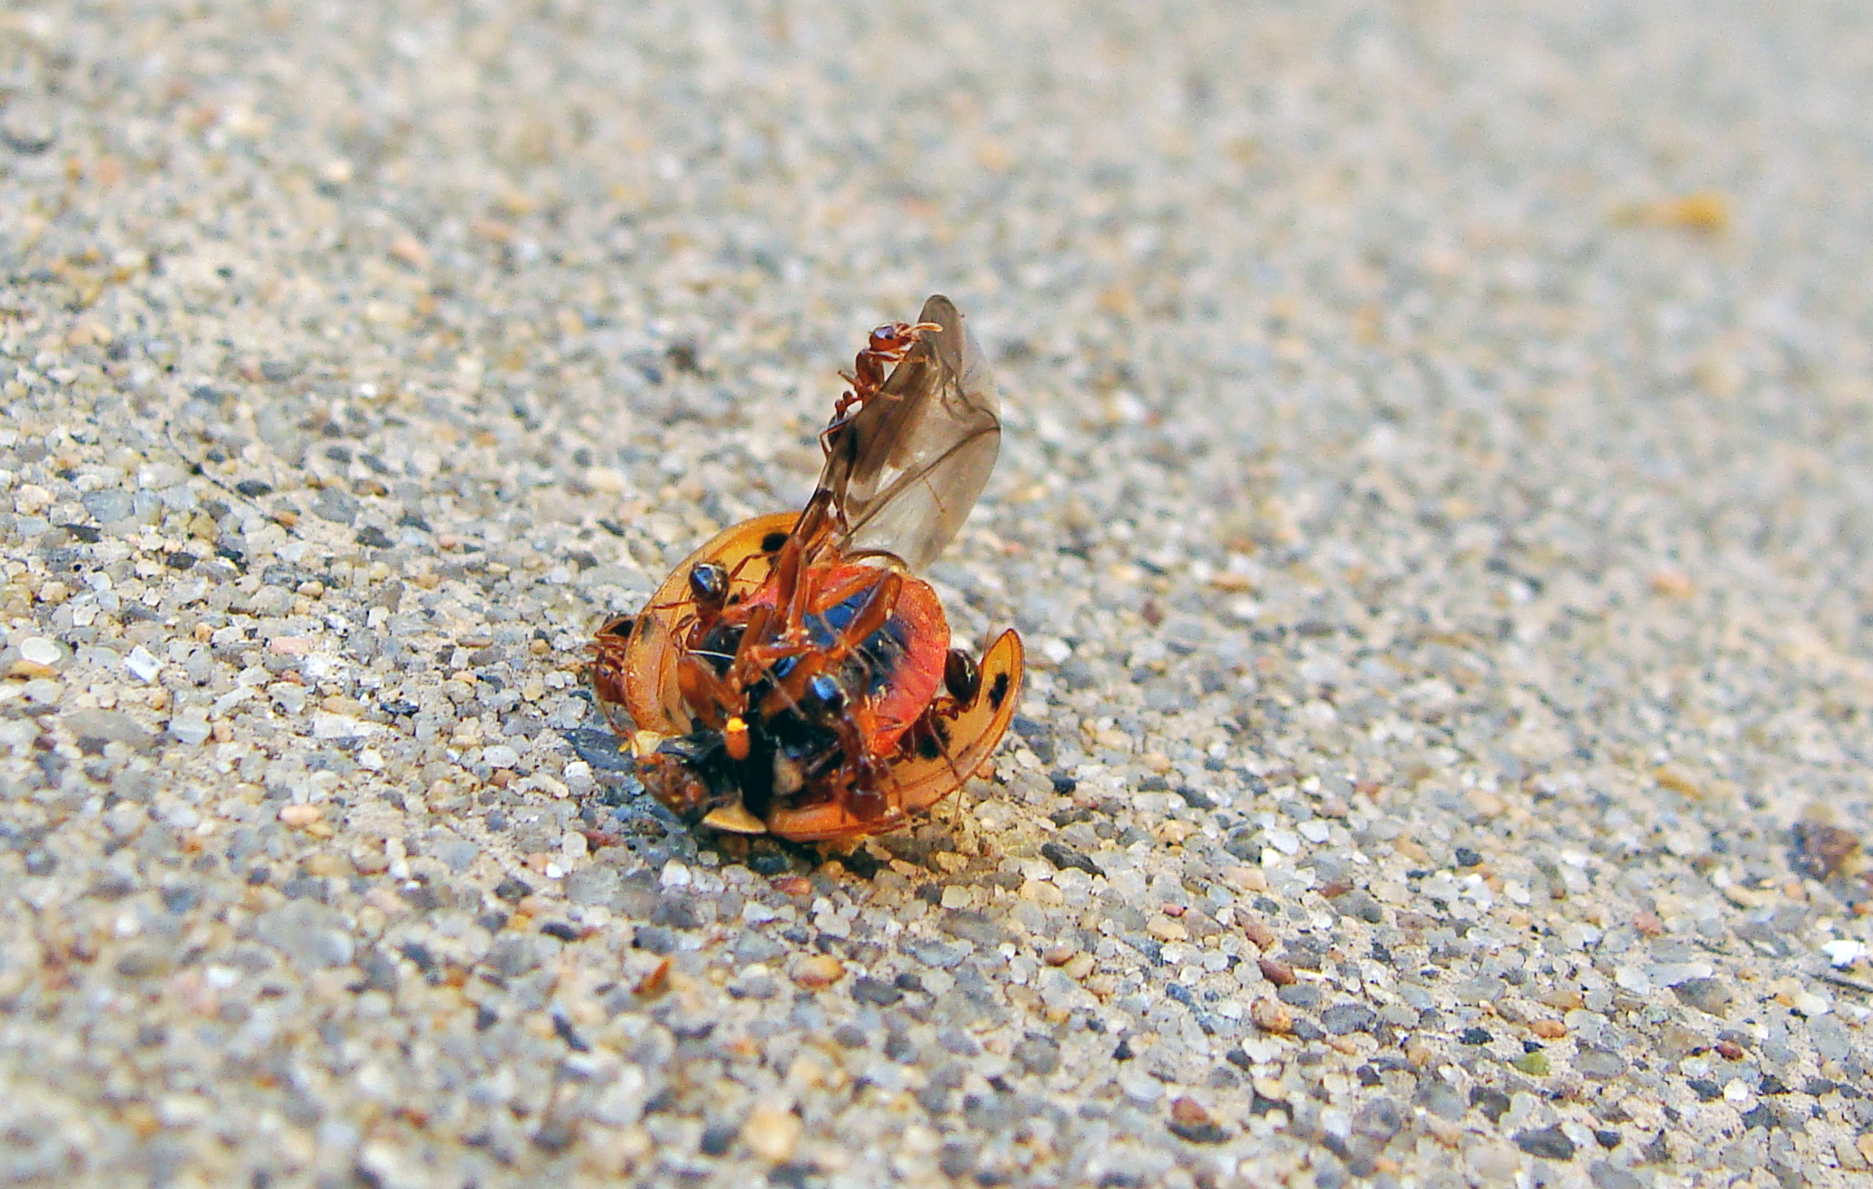 11-12-Lady Bug-Ants 3.jpg